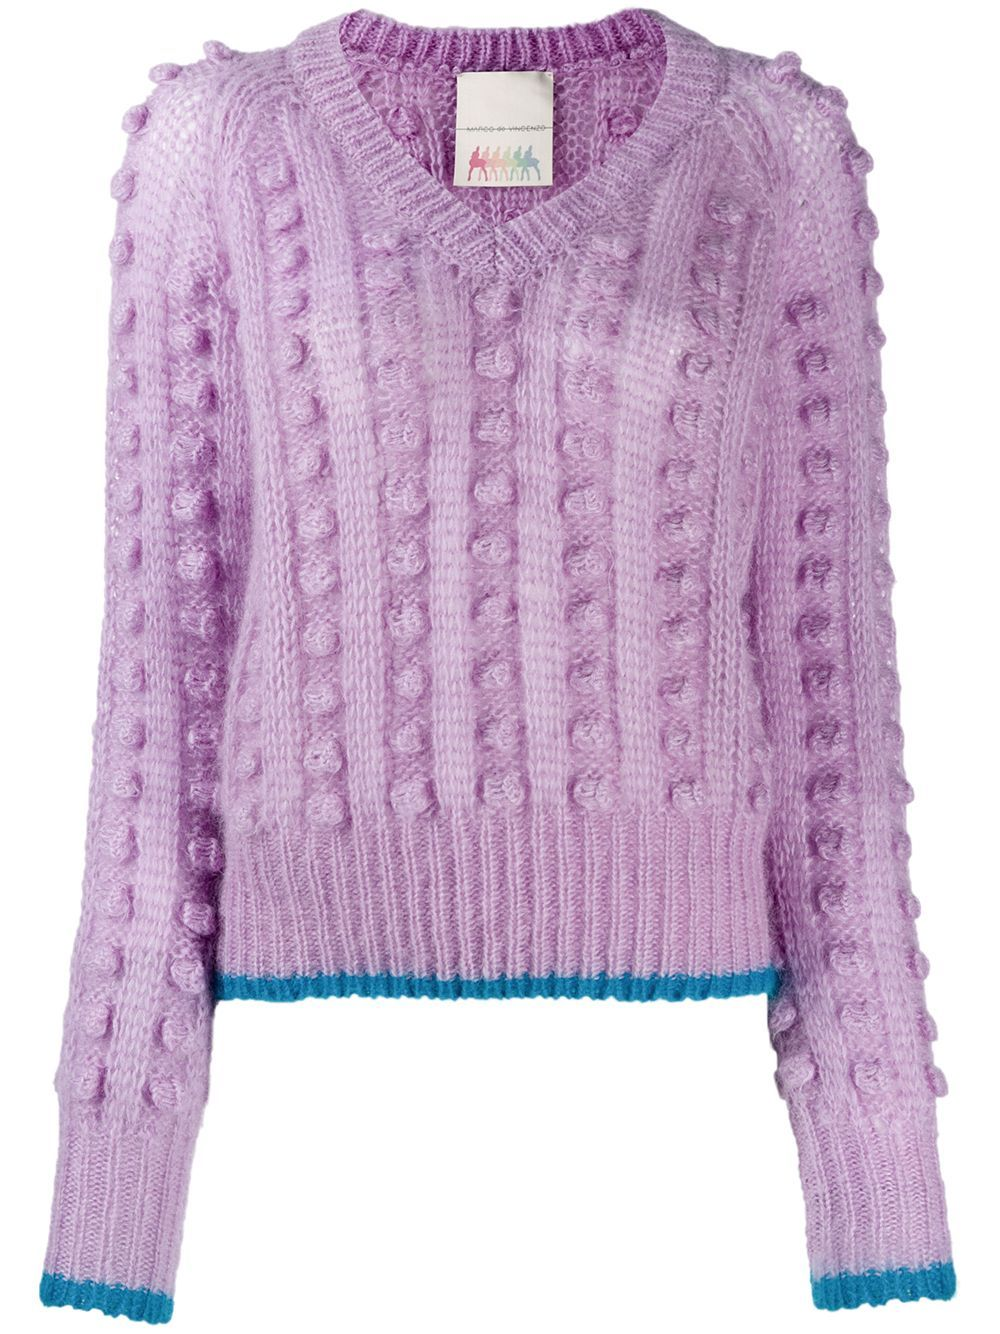 Marco De Vincenzo chunky bobble knit jumper - PURPLE